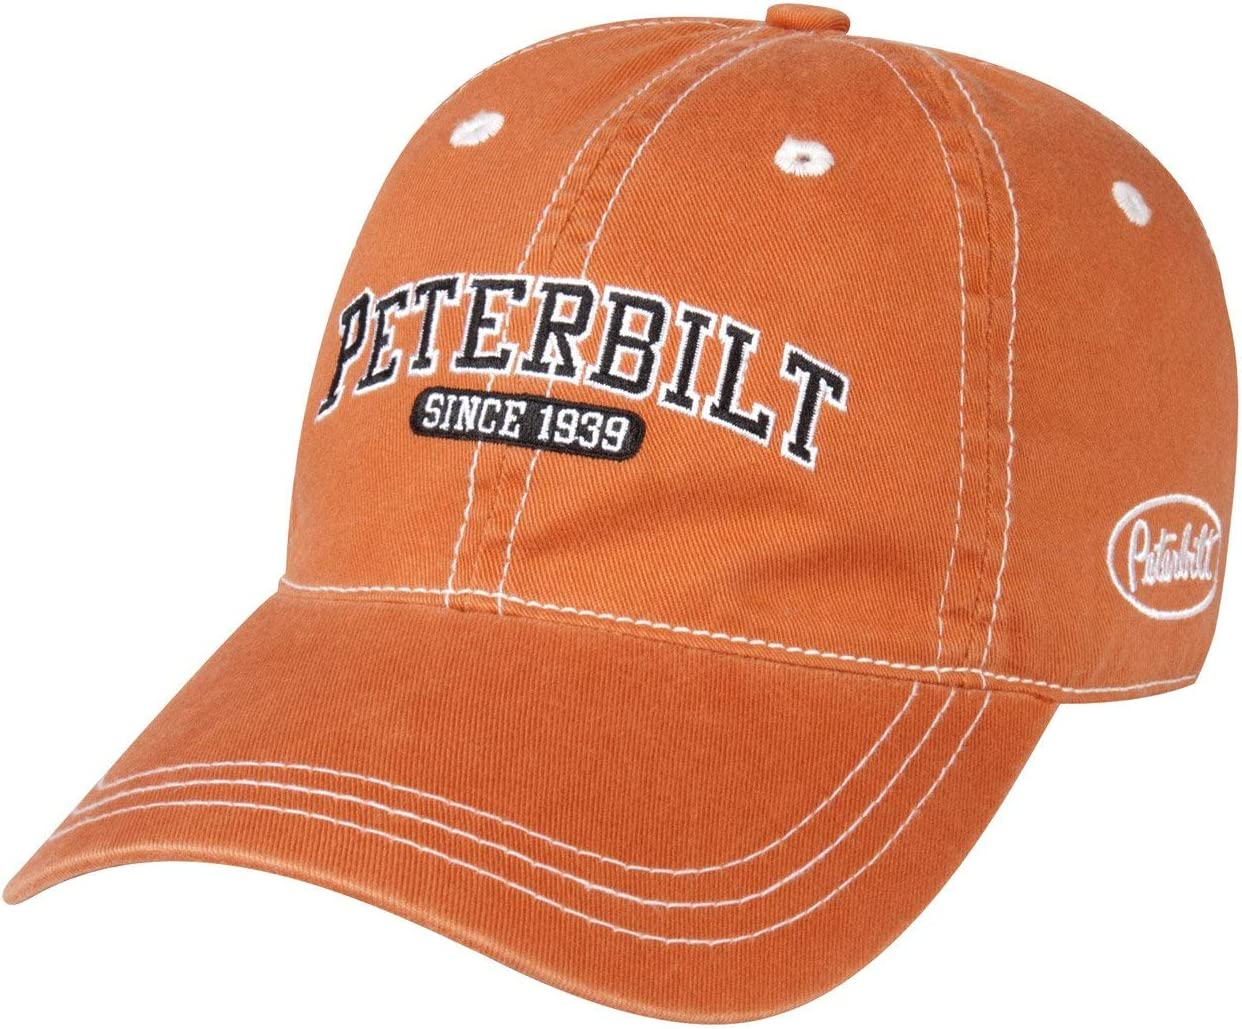 Peterbilt Trucks Motors Since 1939 Unstructured Burnt Orange Cap//Hat